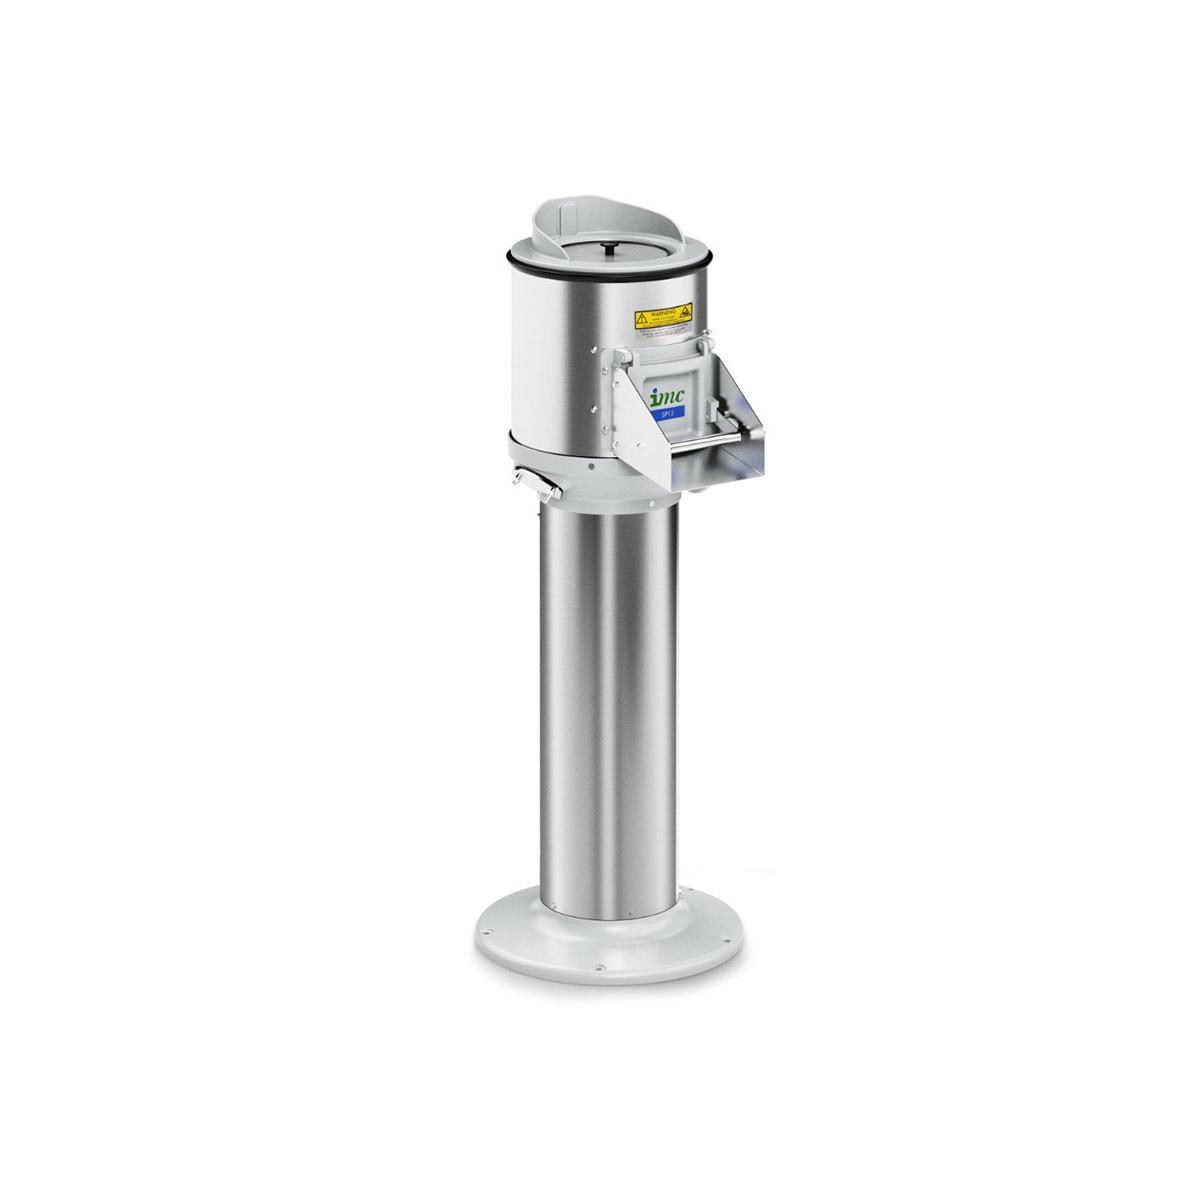 F58/902 - IMC SP12H Floor-Mounted Potato Peeler - 1 Phase - H 1400 mm - 0.37 kW